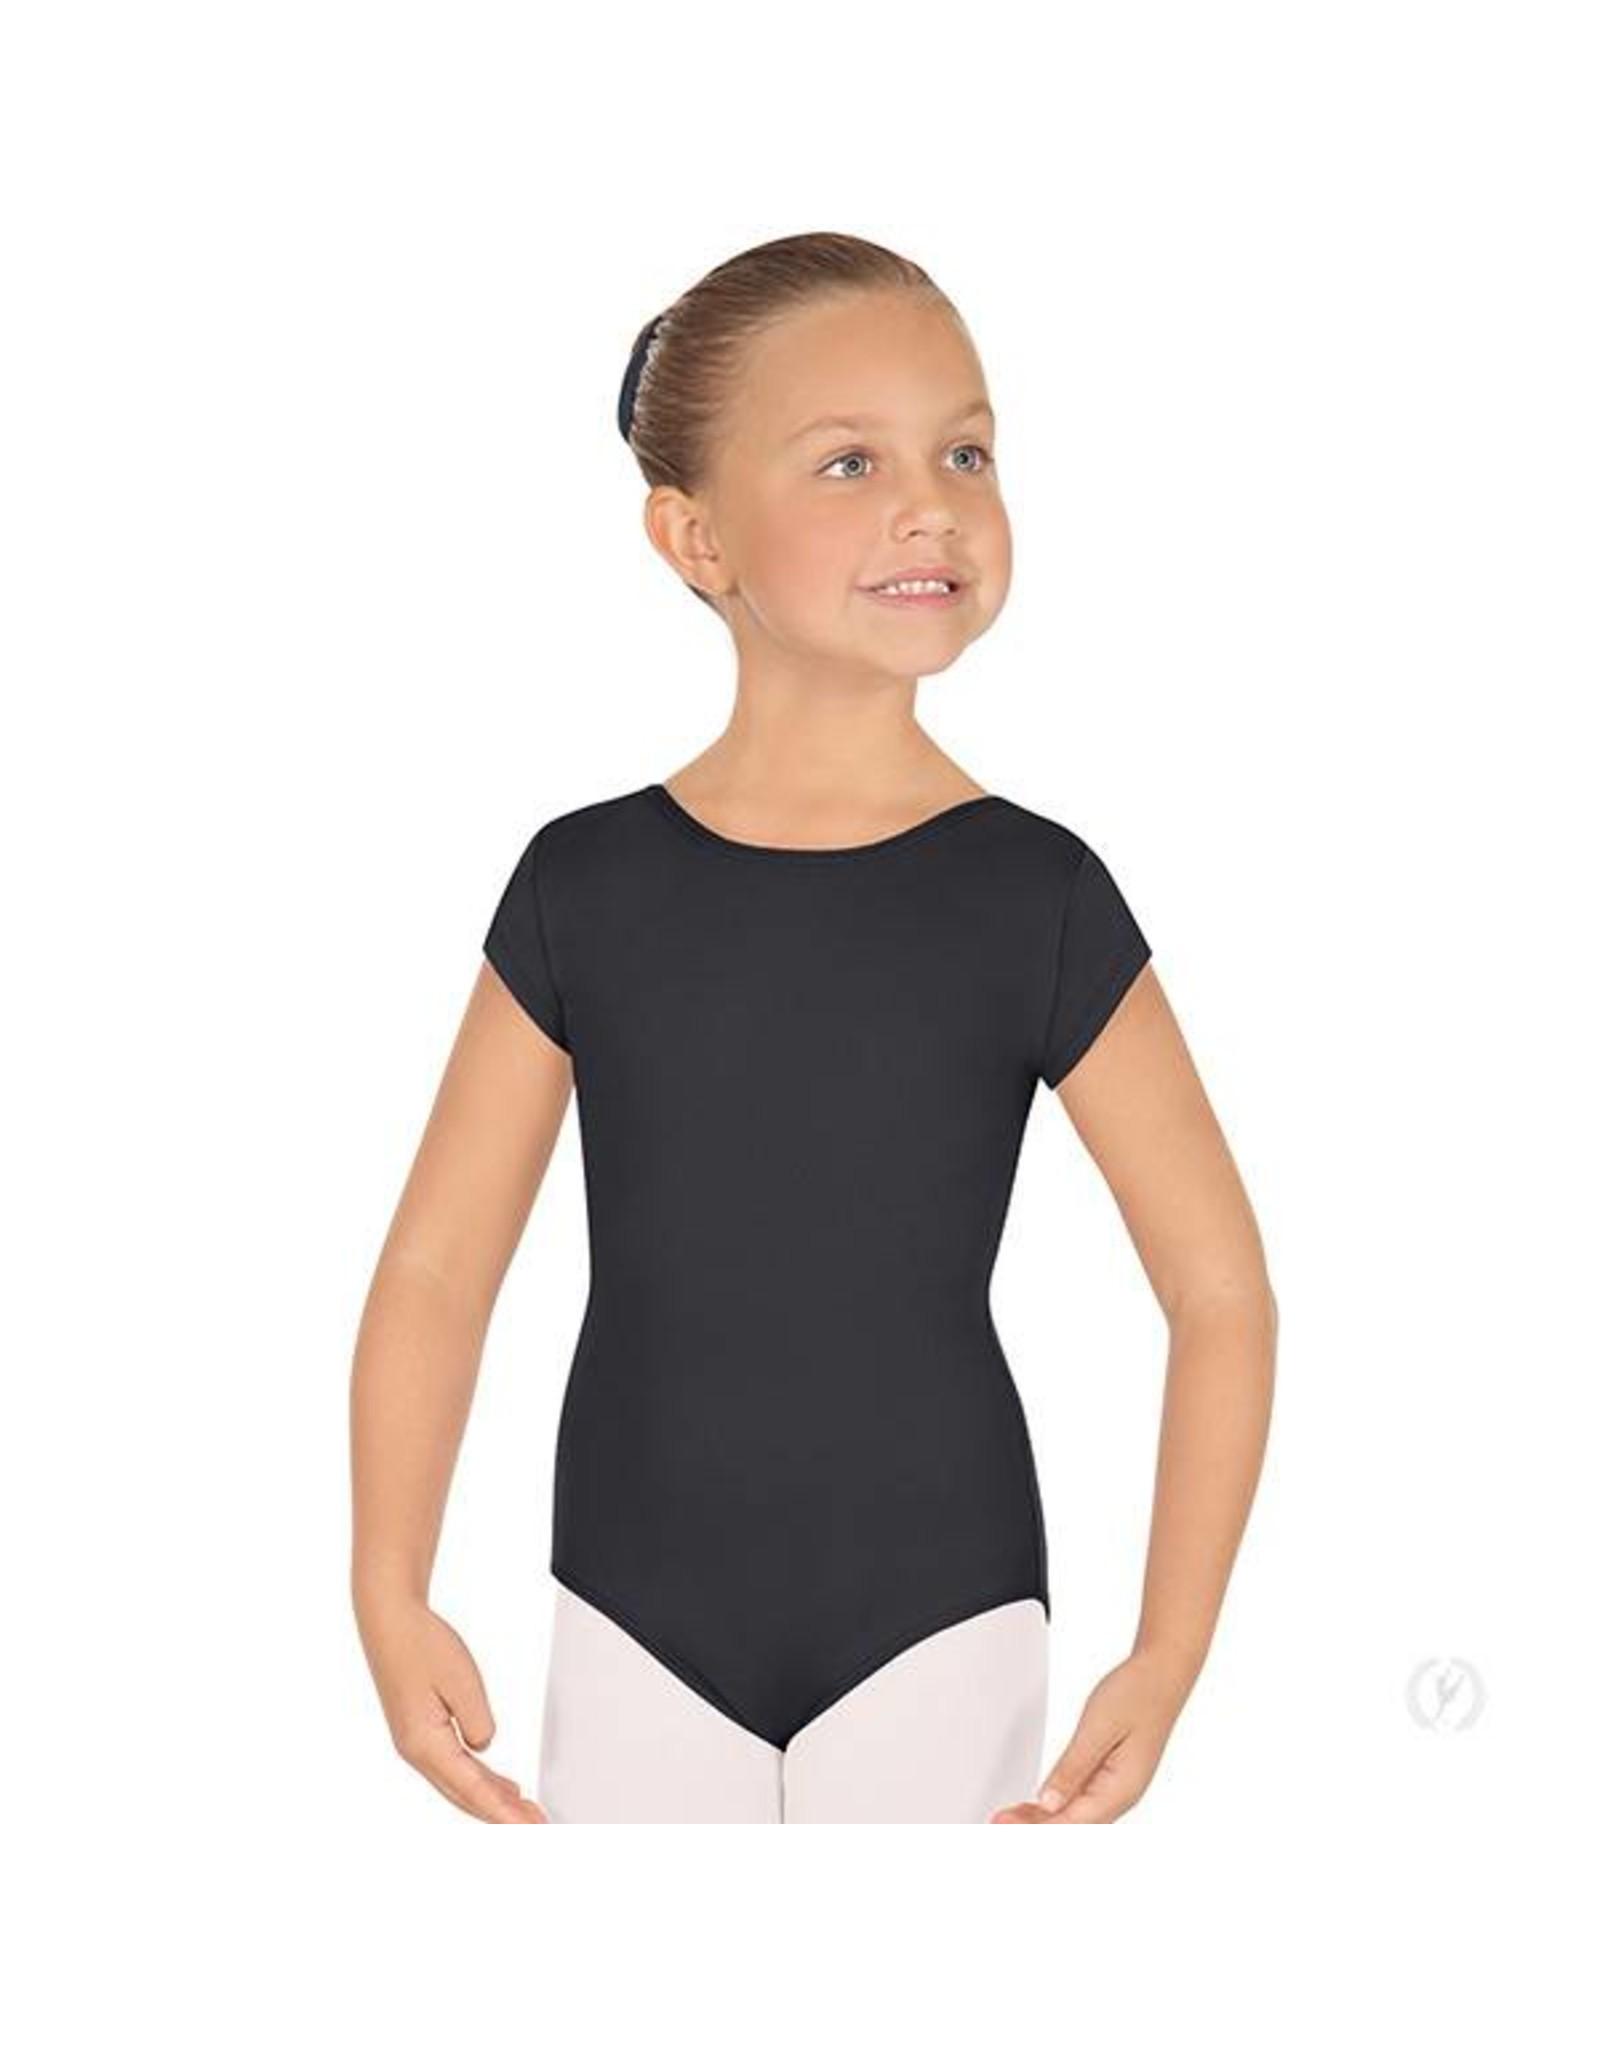 Eurotard 44475C CHILD SHORT SLEEVE TACTEL LEOTARD BLACK